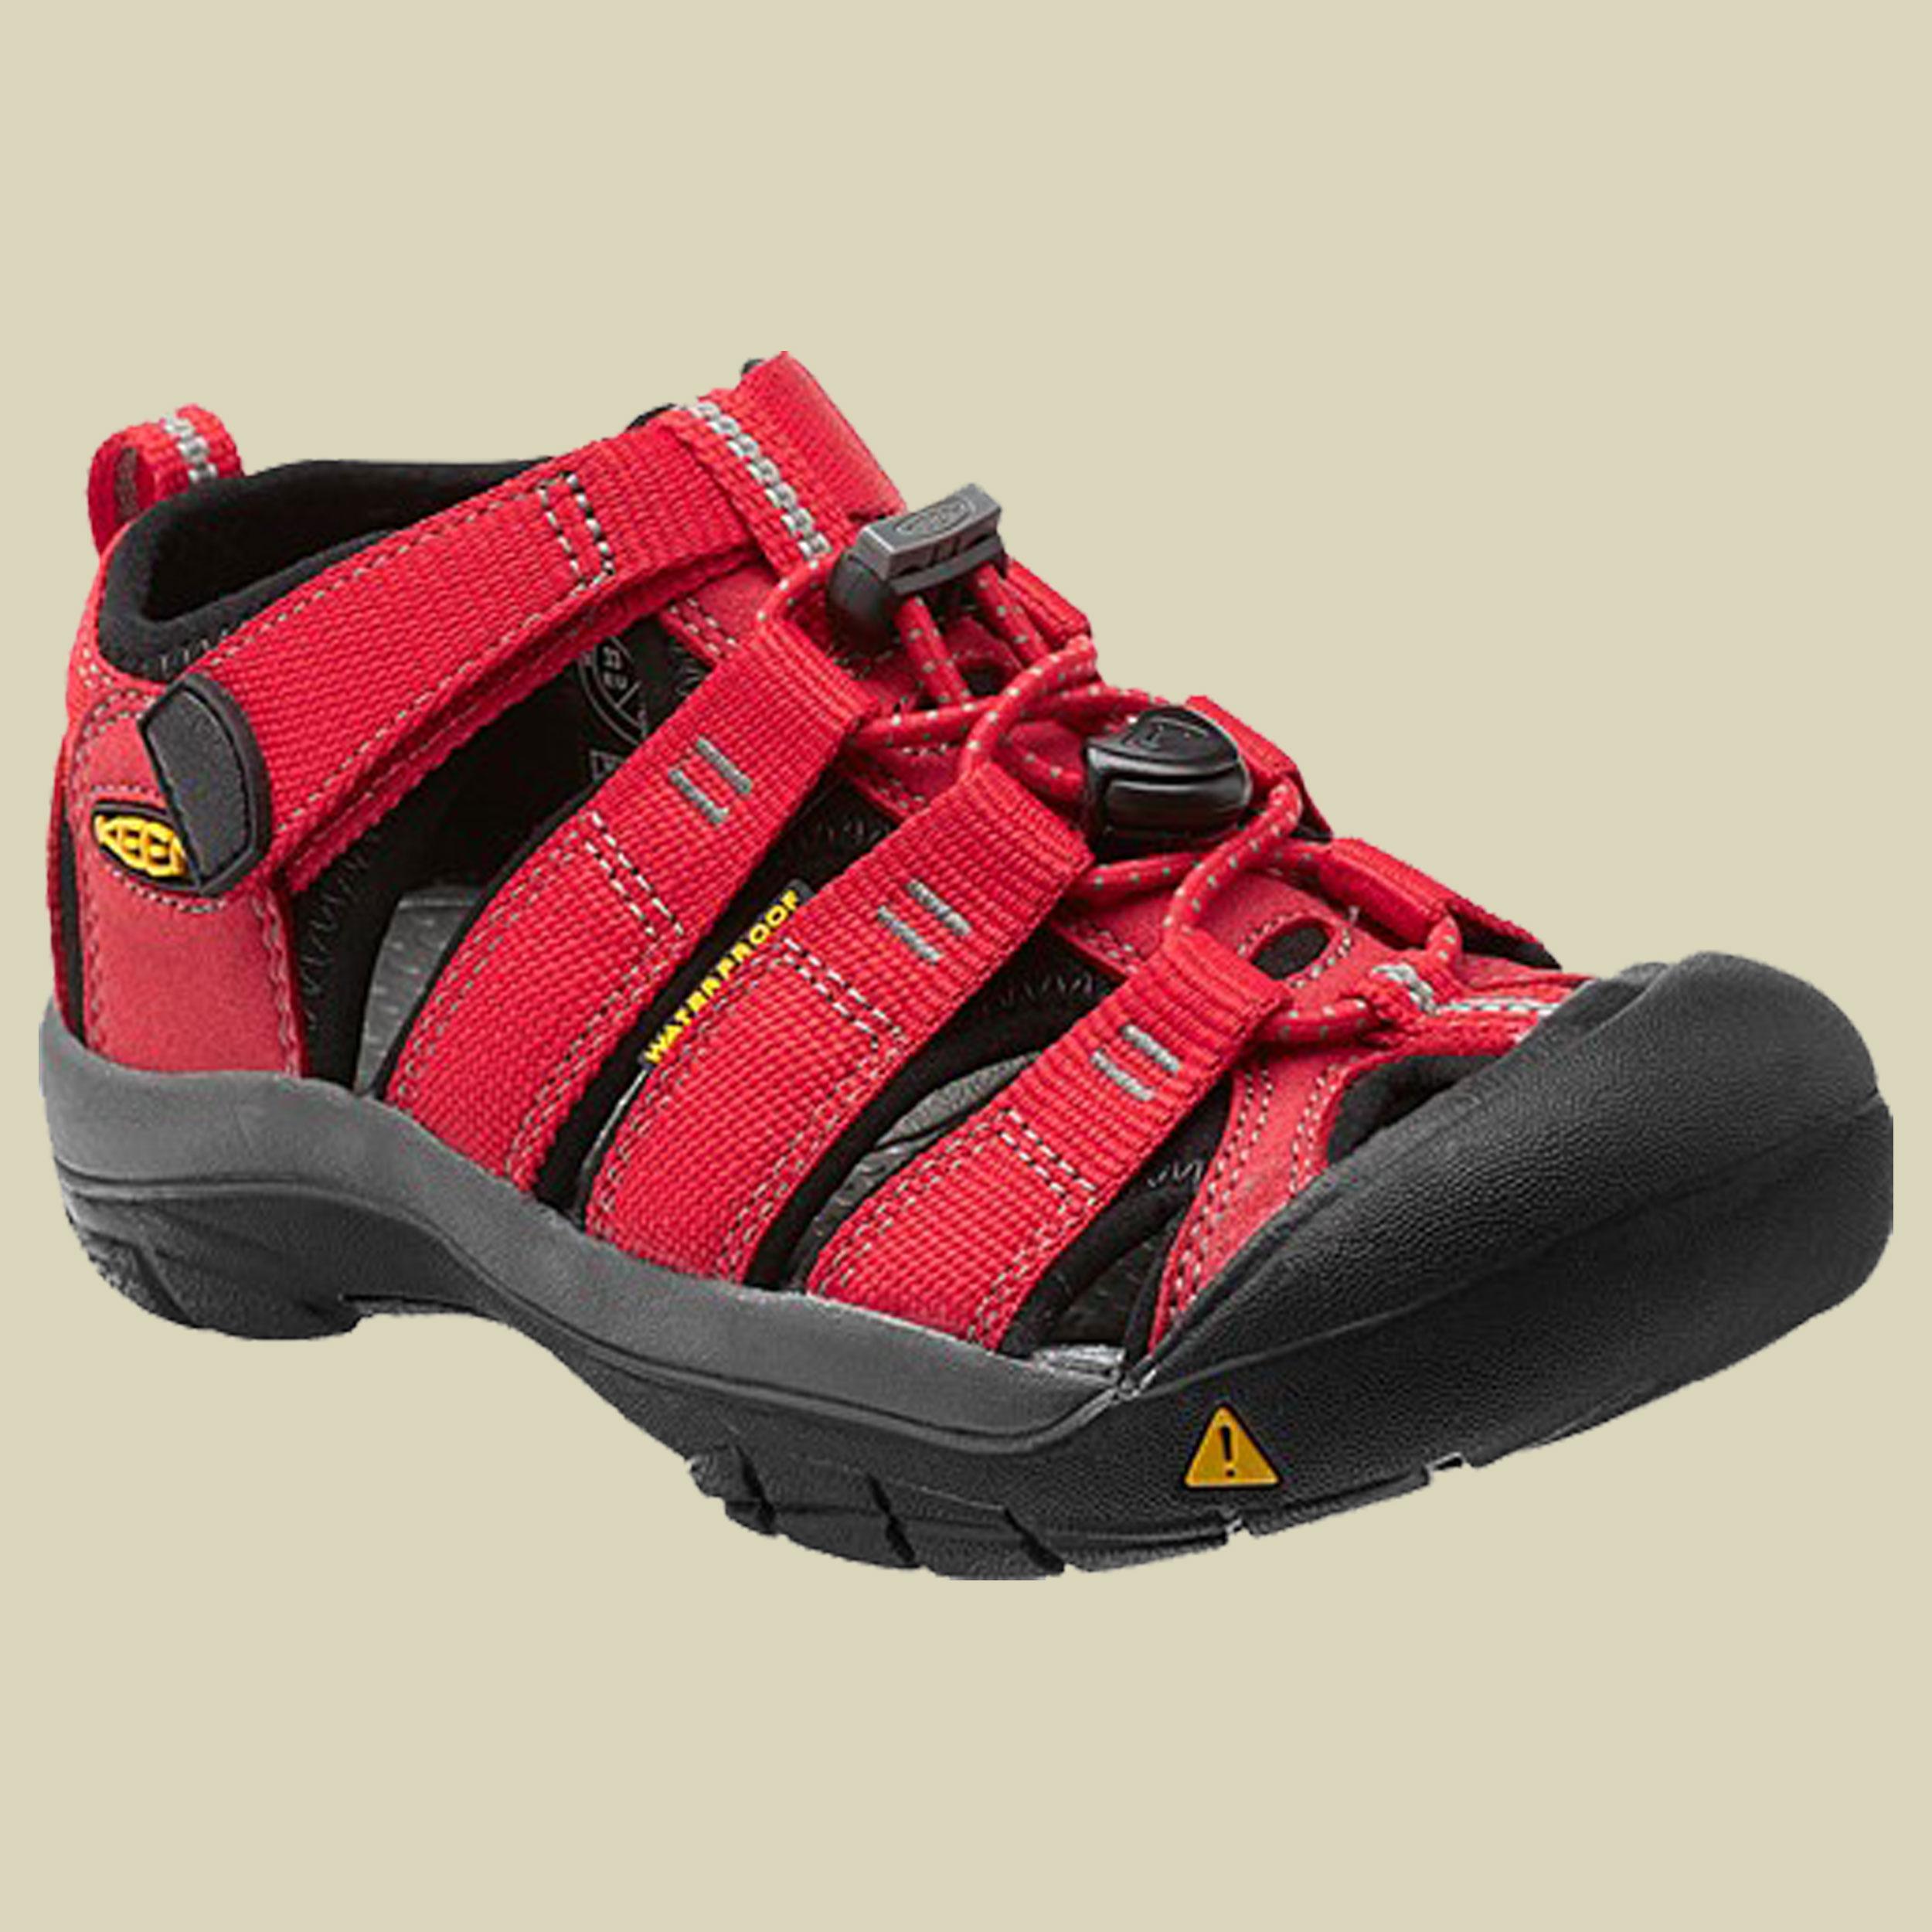 Keen Newport H2 Kids Trekking Sandale Kinder Größe 25-26 ribbon red-gargoyle